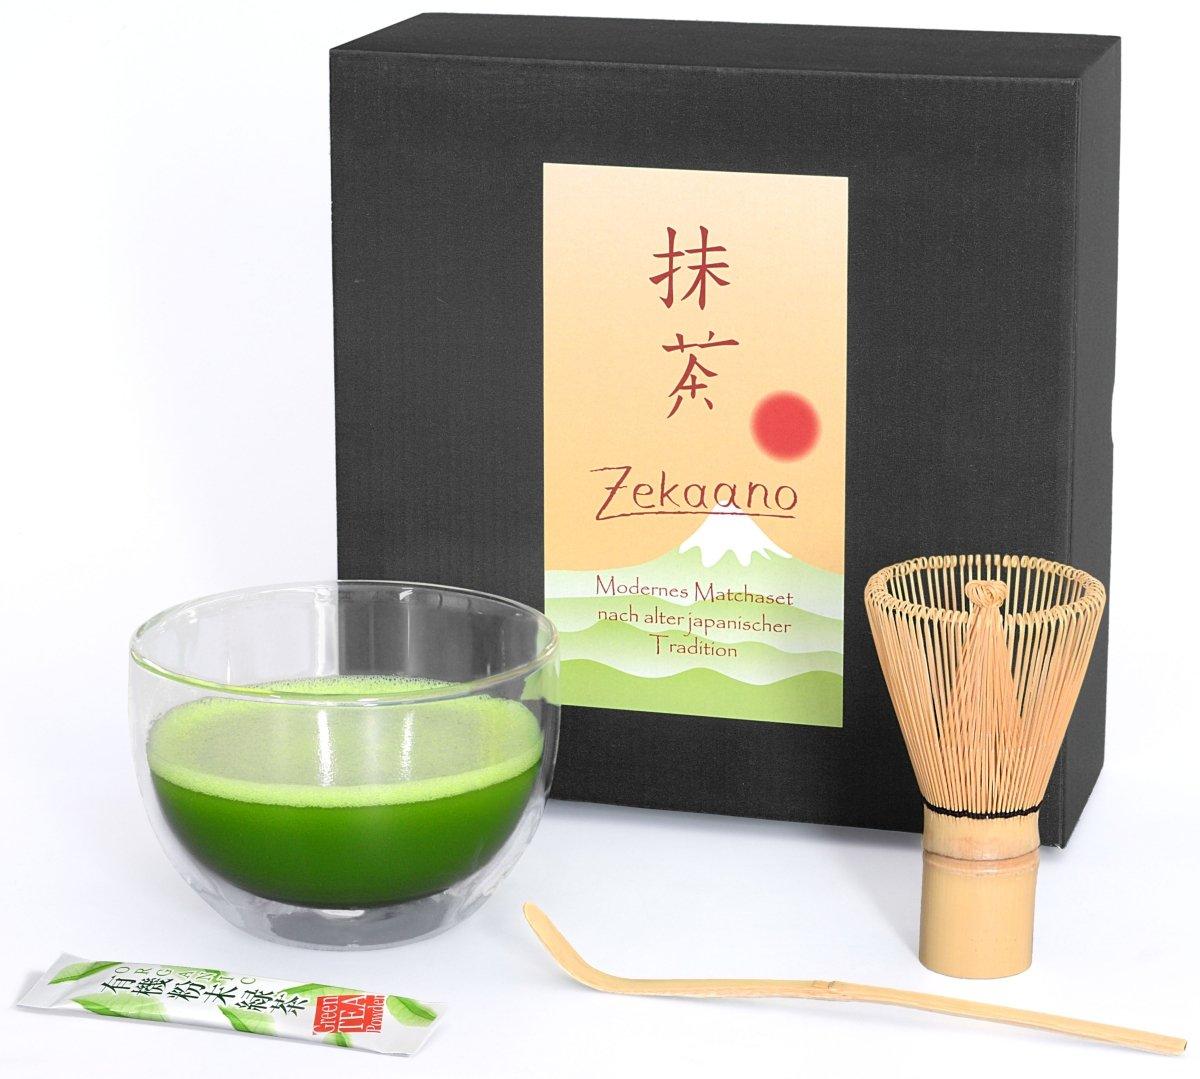 Aricola® Matcha 3-Piece Set, 400-ml Double-Walled Thermal Glass, Matcha Bowl, Matcha Bamboo Spoon, Matcha Bamboo Brush in Gift Box